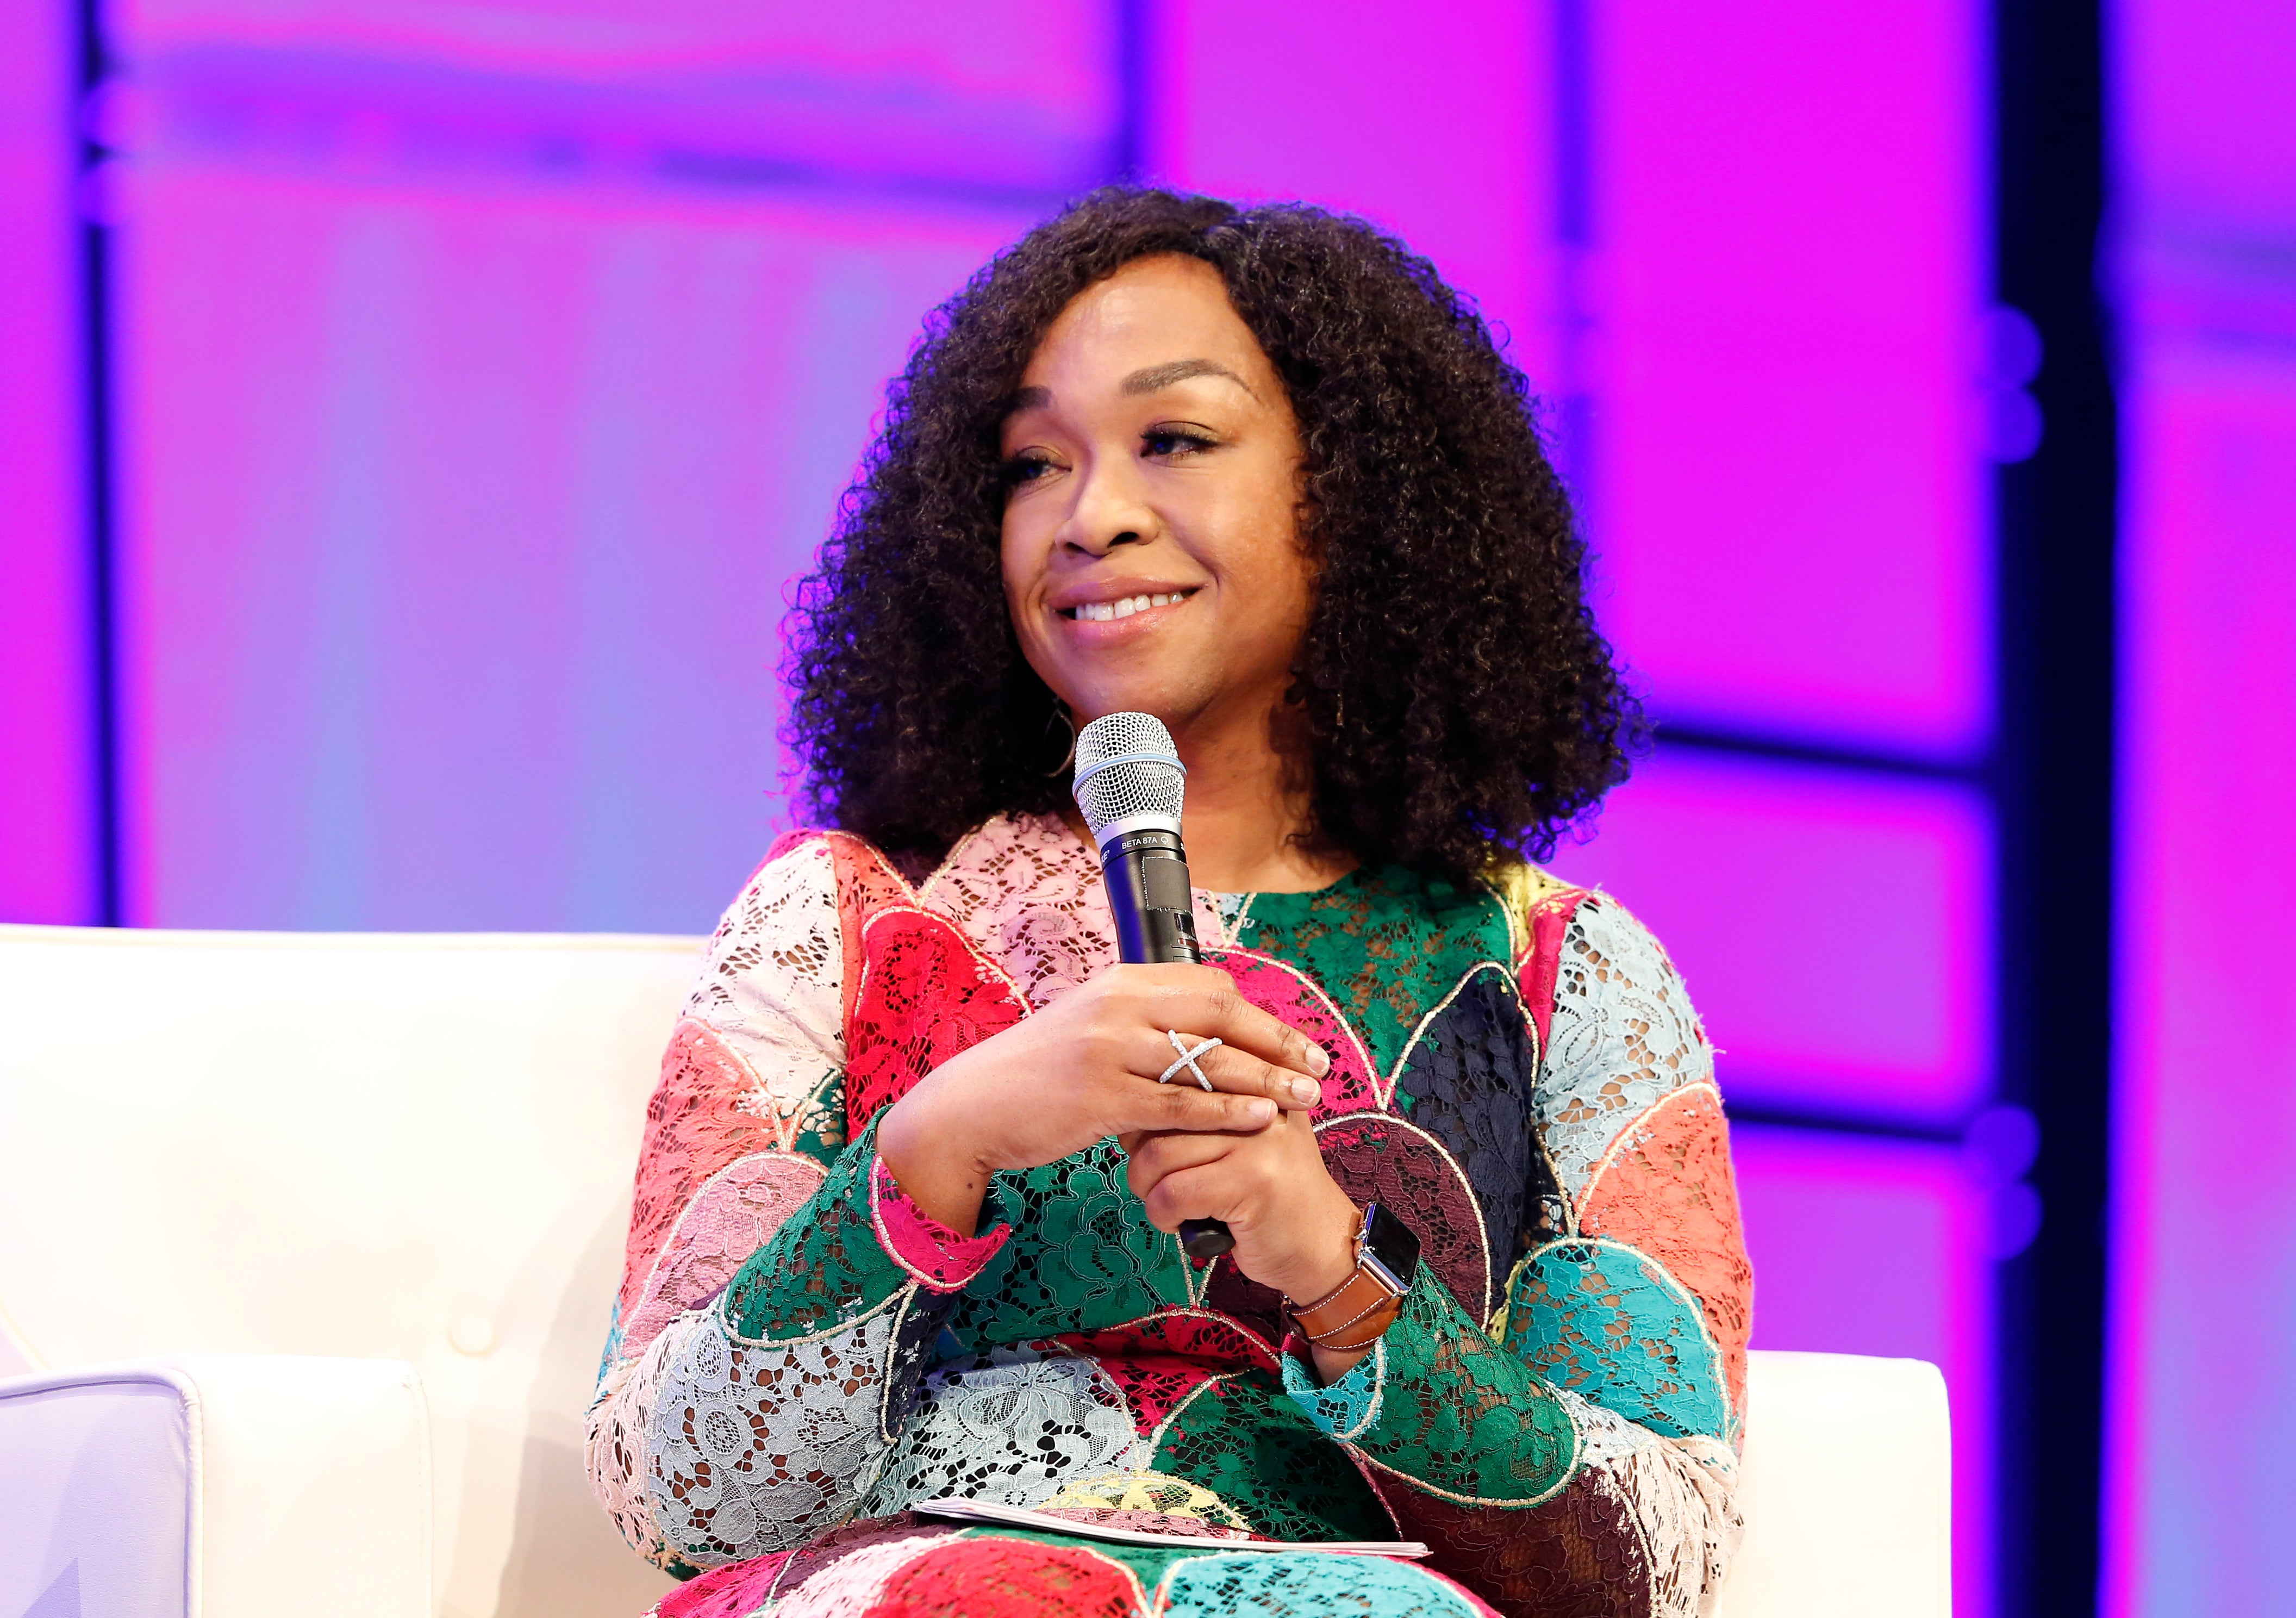 Shonda Rhimes Remembers How Oprah Winfrey Inspired Her Career